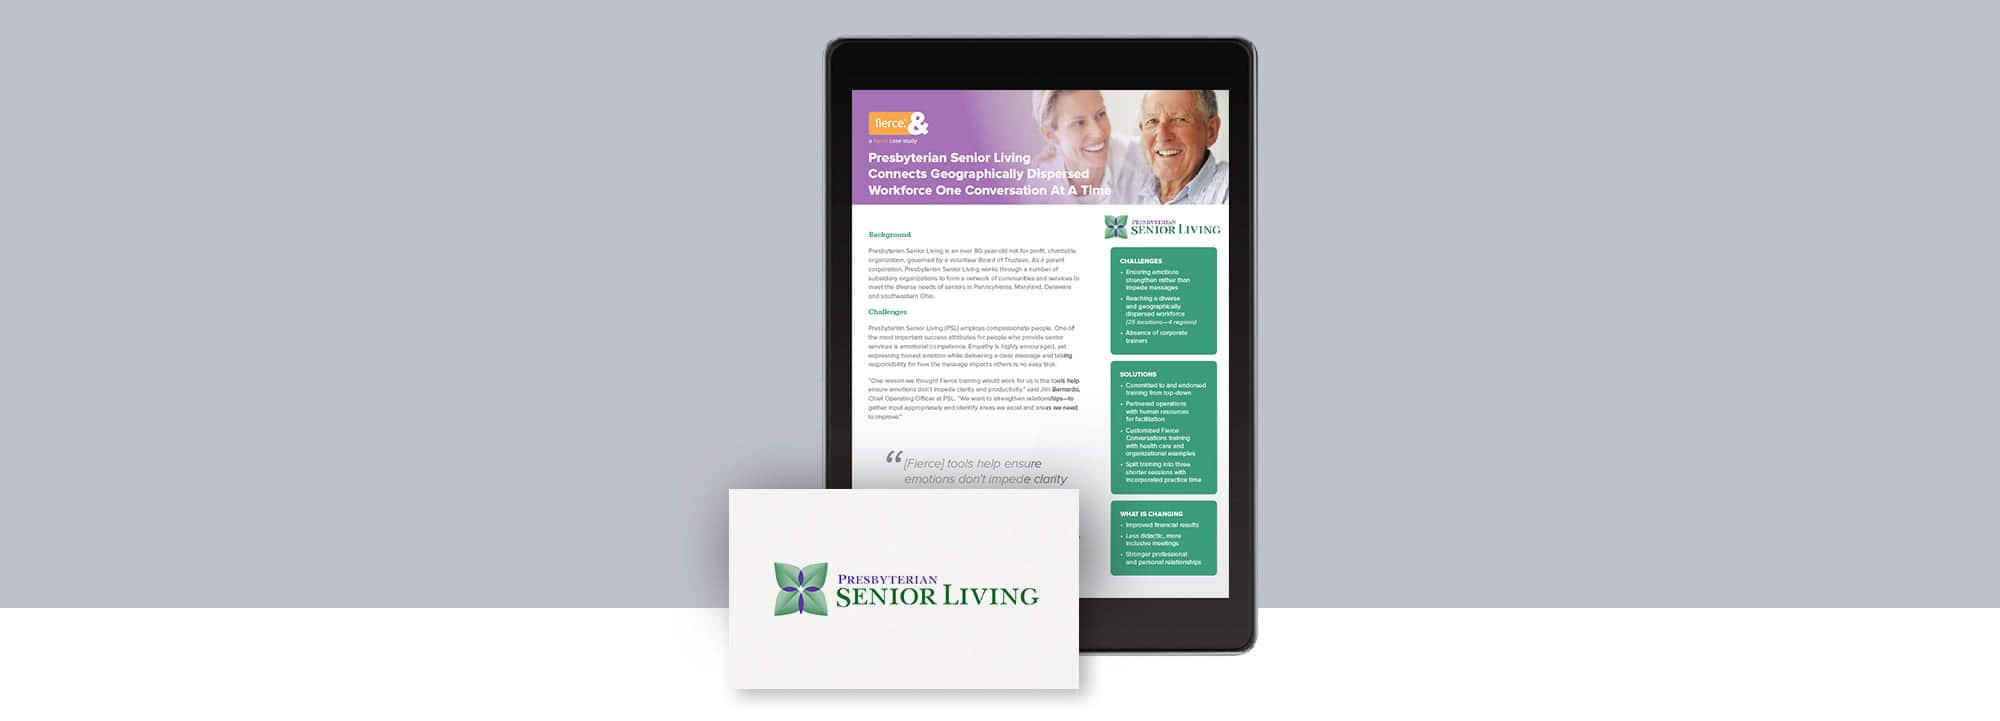 Fierce Conversations Presbyterian Senior Living Case Study